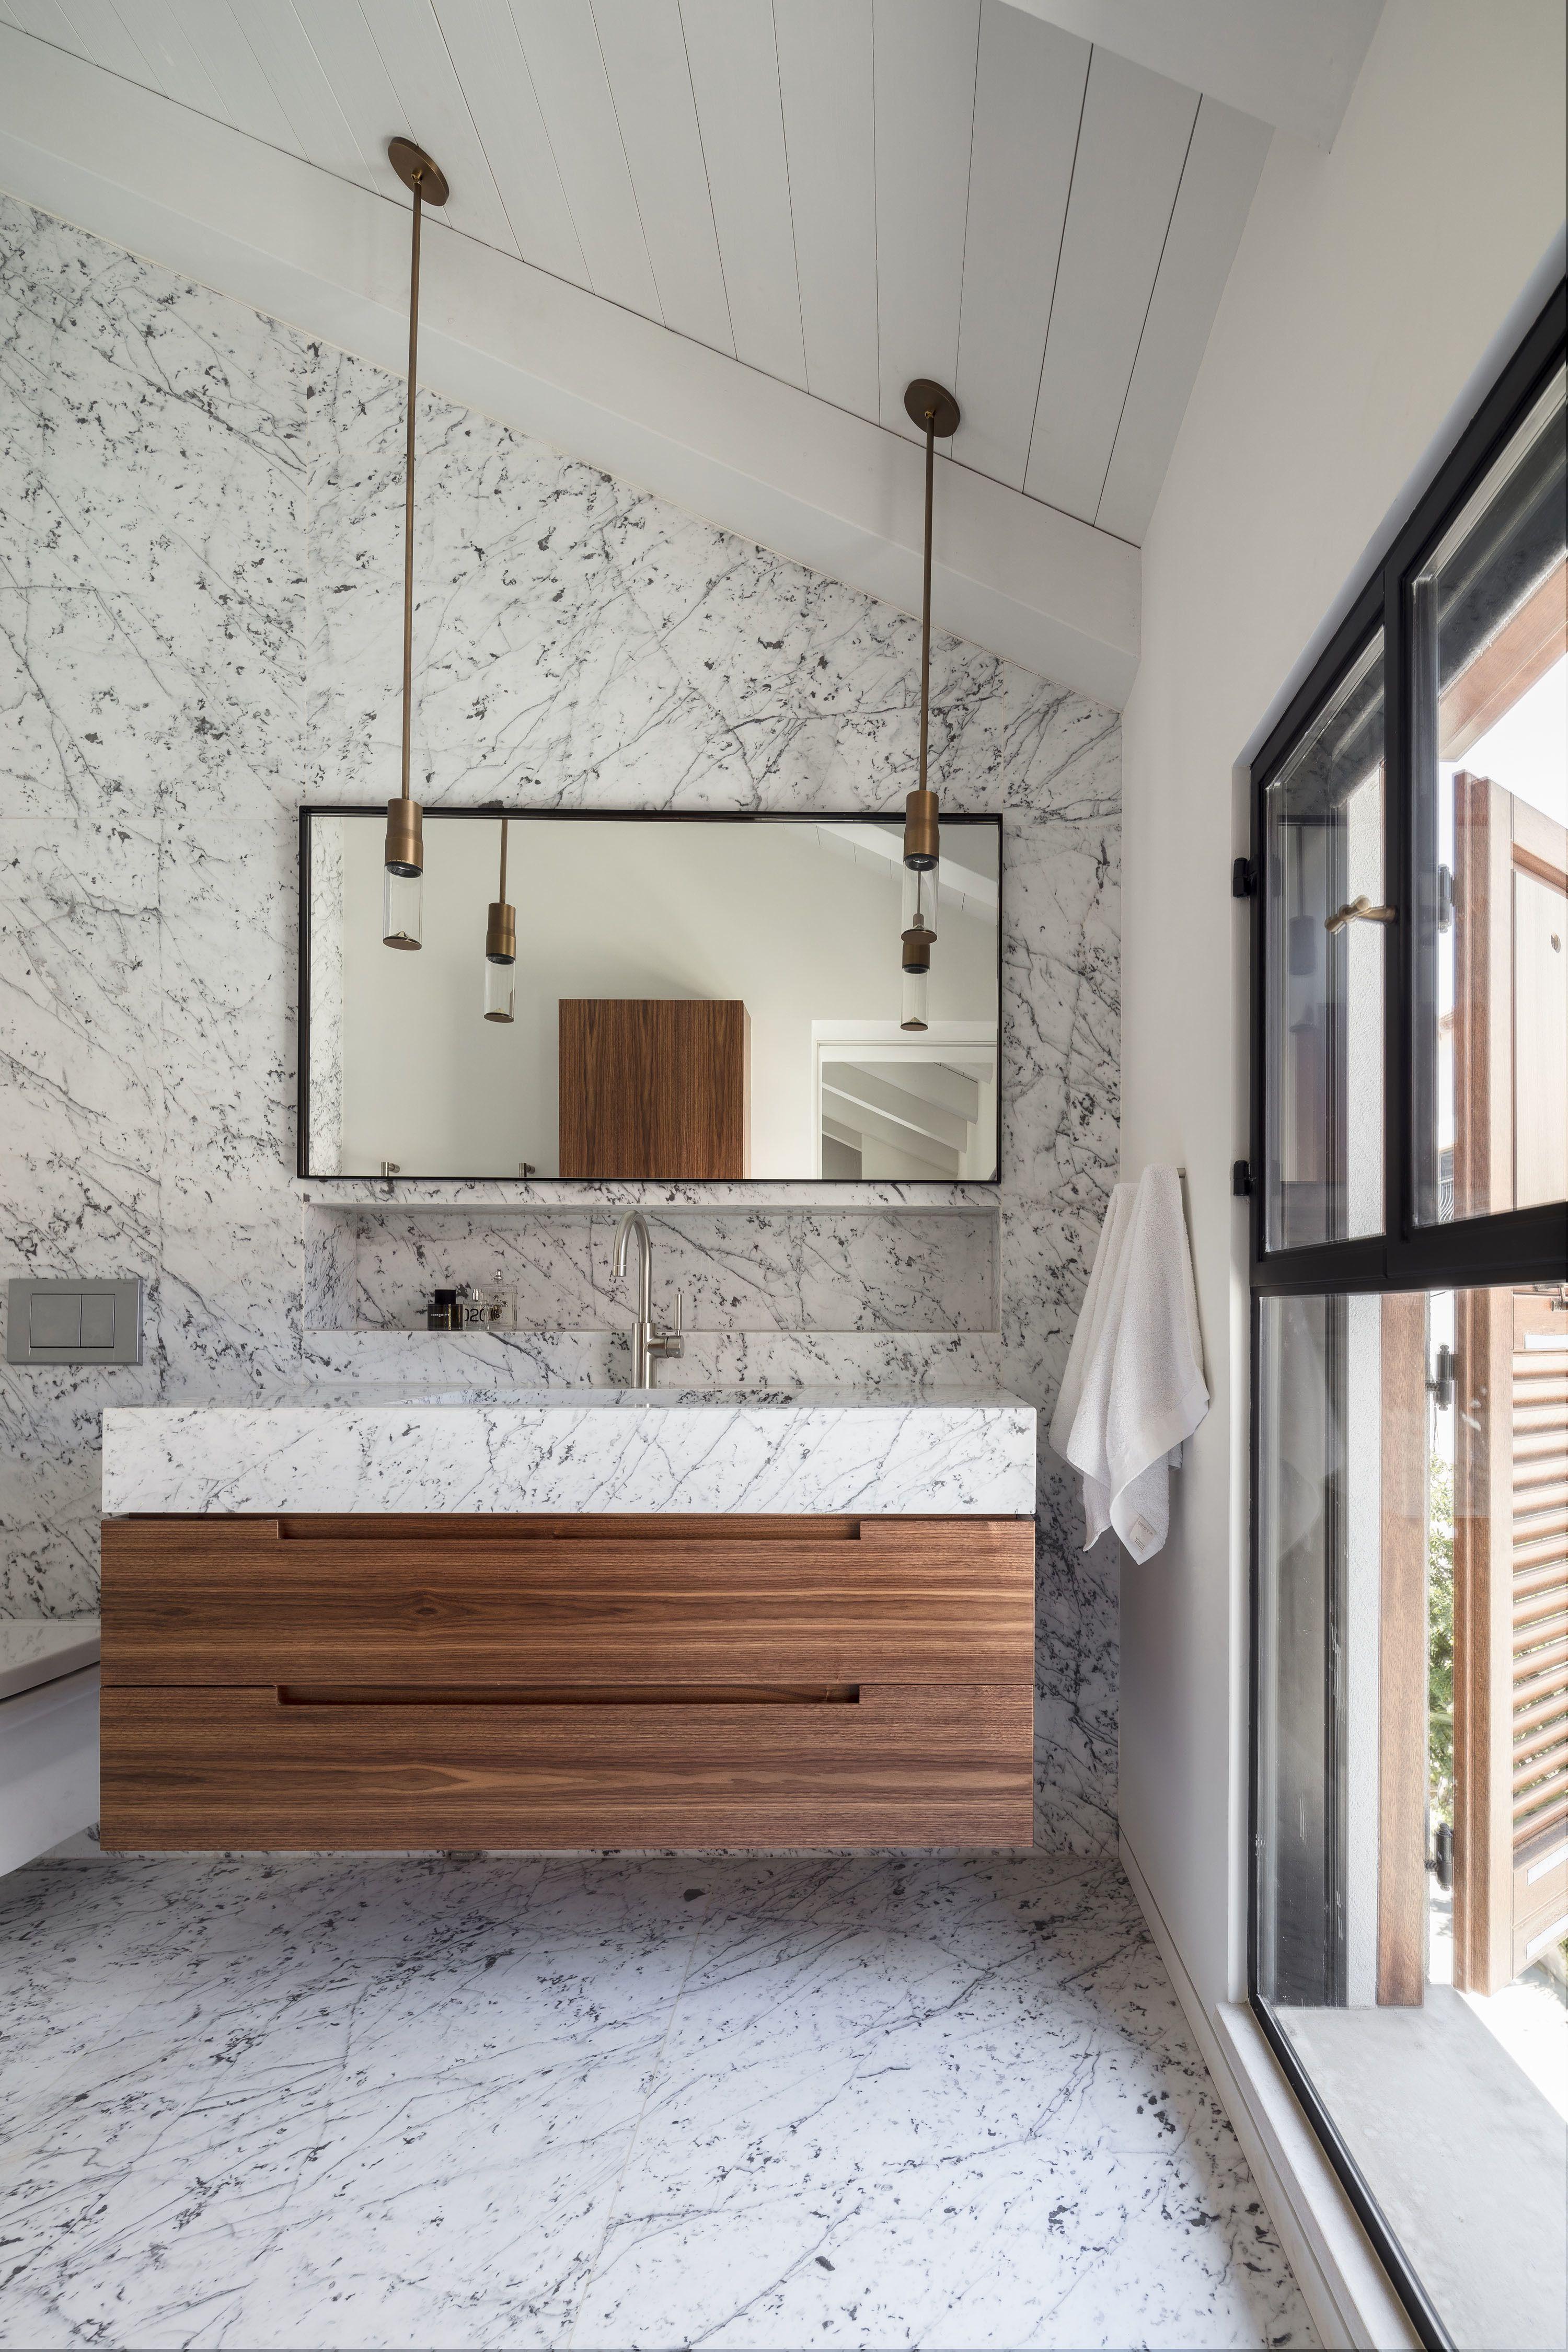 The Charm Townhouse By Mga Meirav Galan Architect Simple Bathroom Decor Diy Bathroom Remodel Bathroom Interior